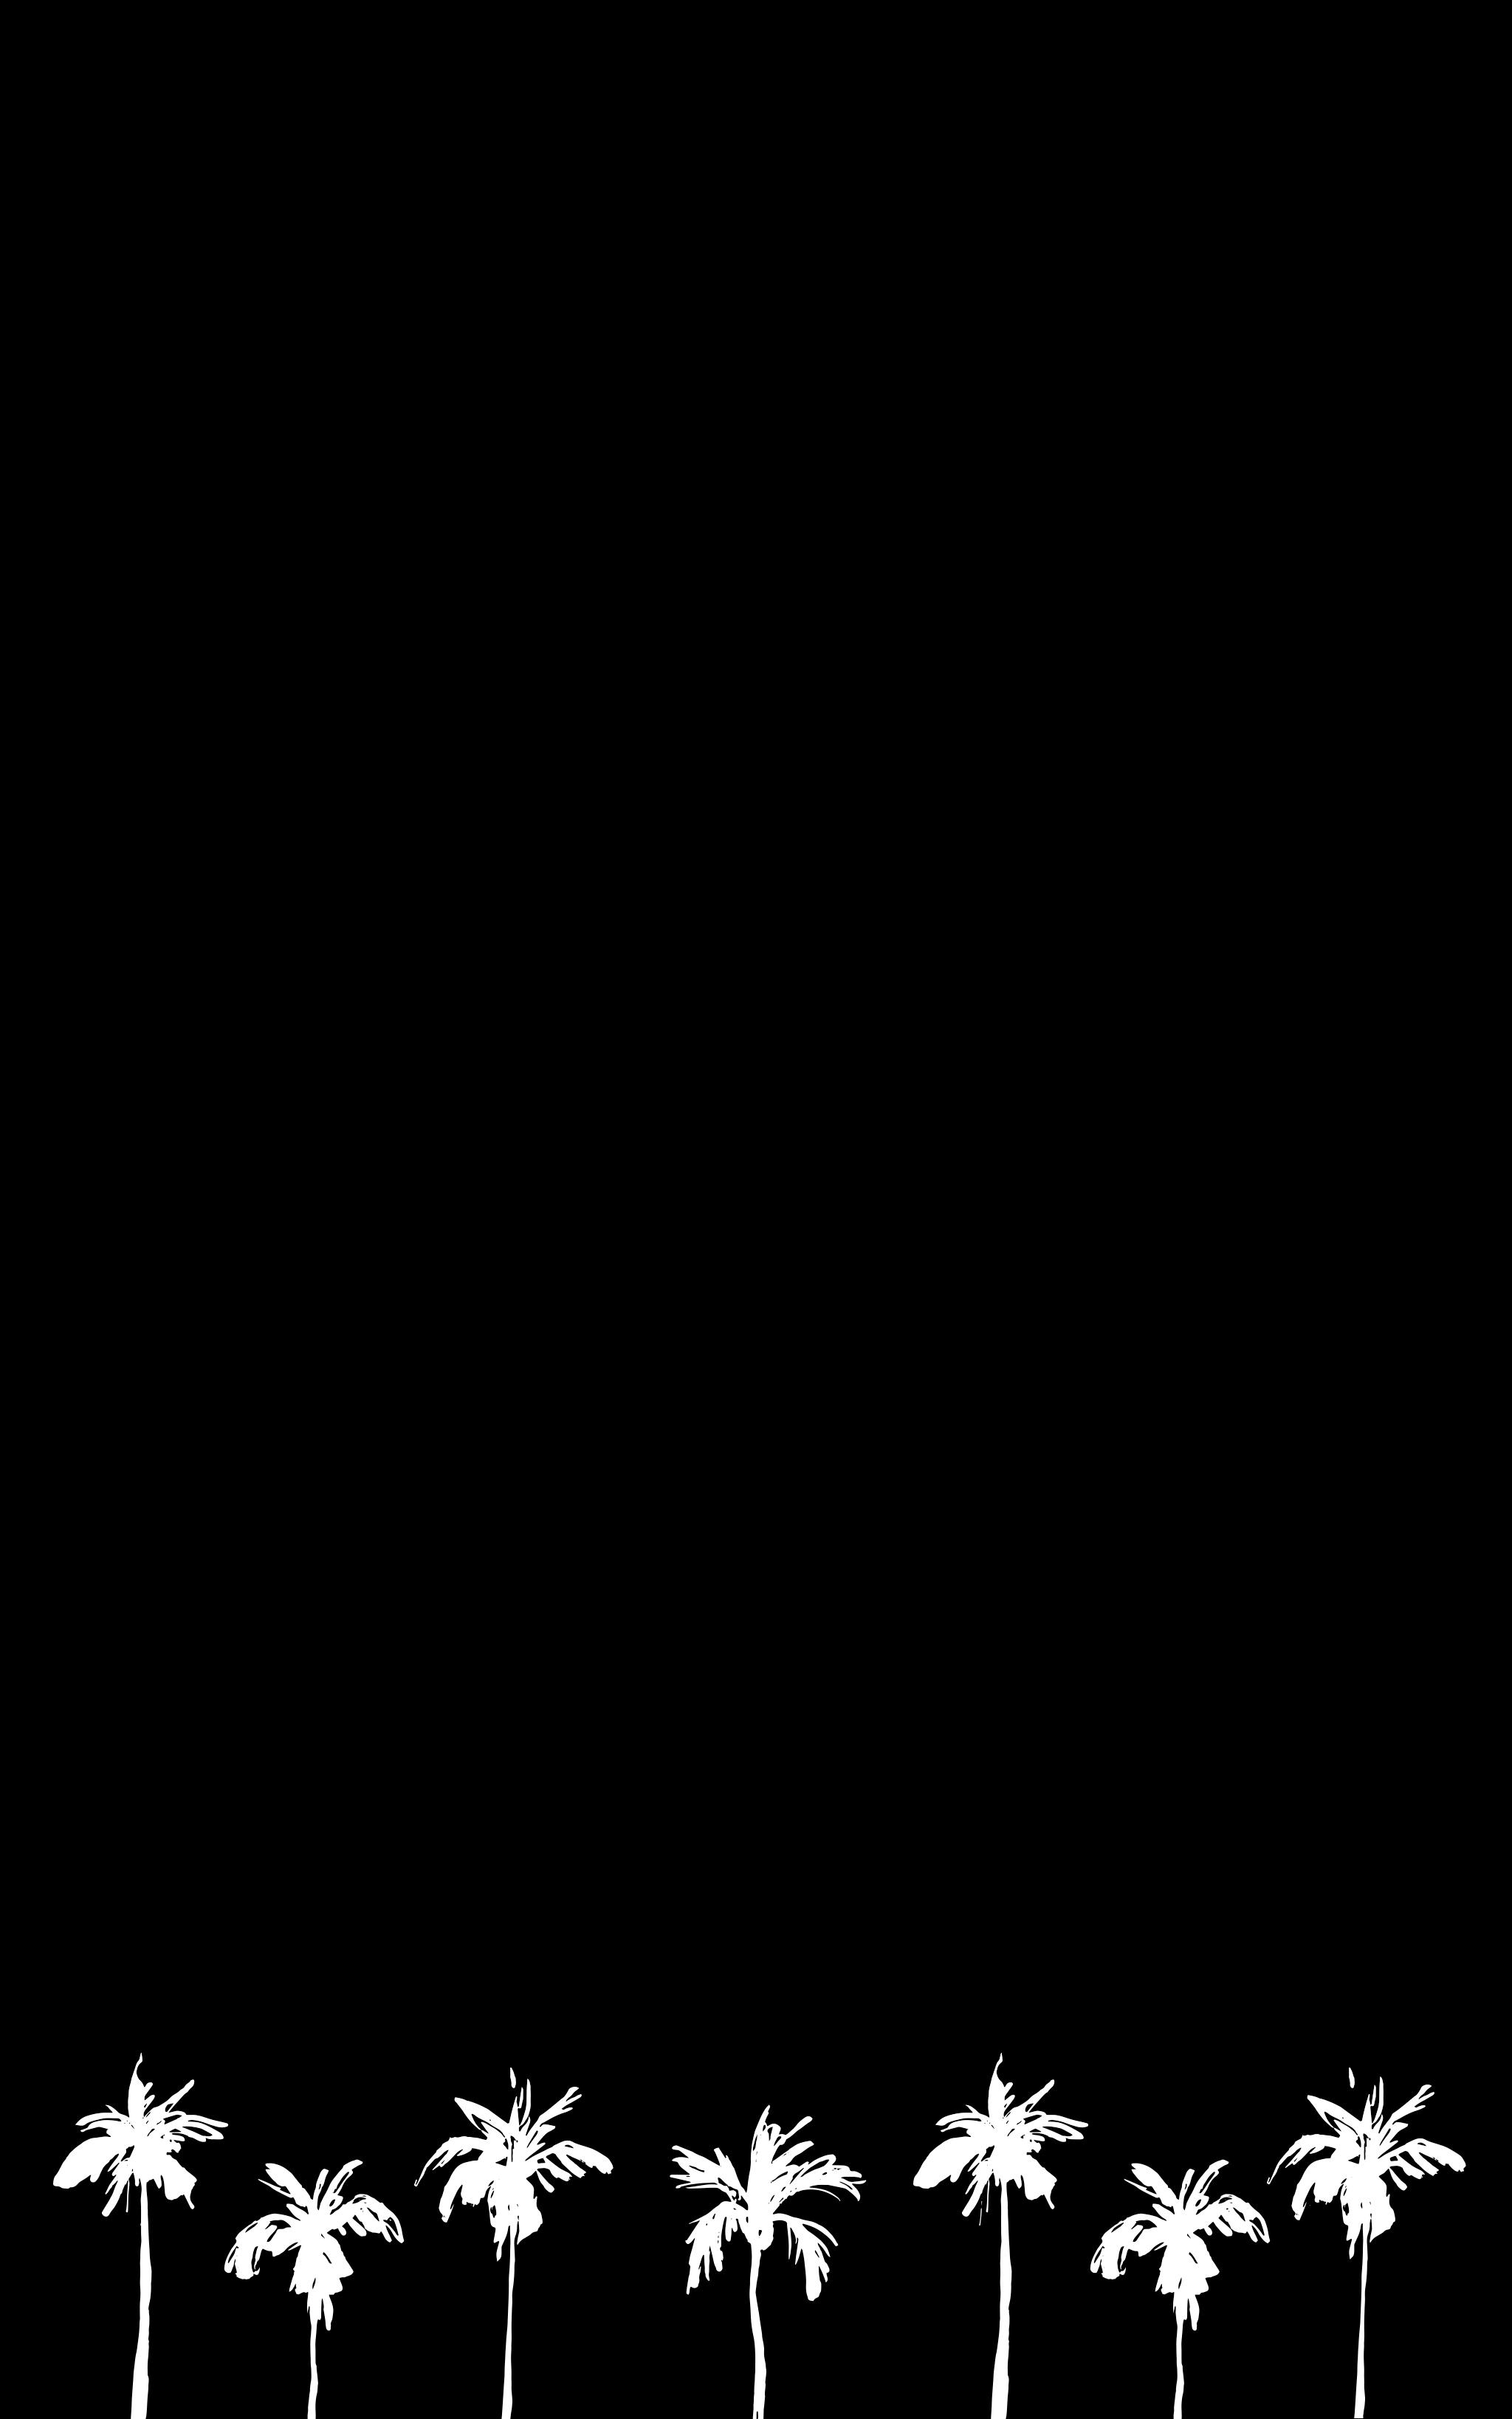 Ipad Vertical_2048x2732_Palm Tree_Black.png